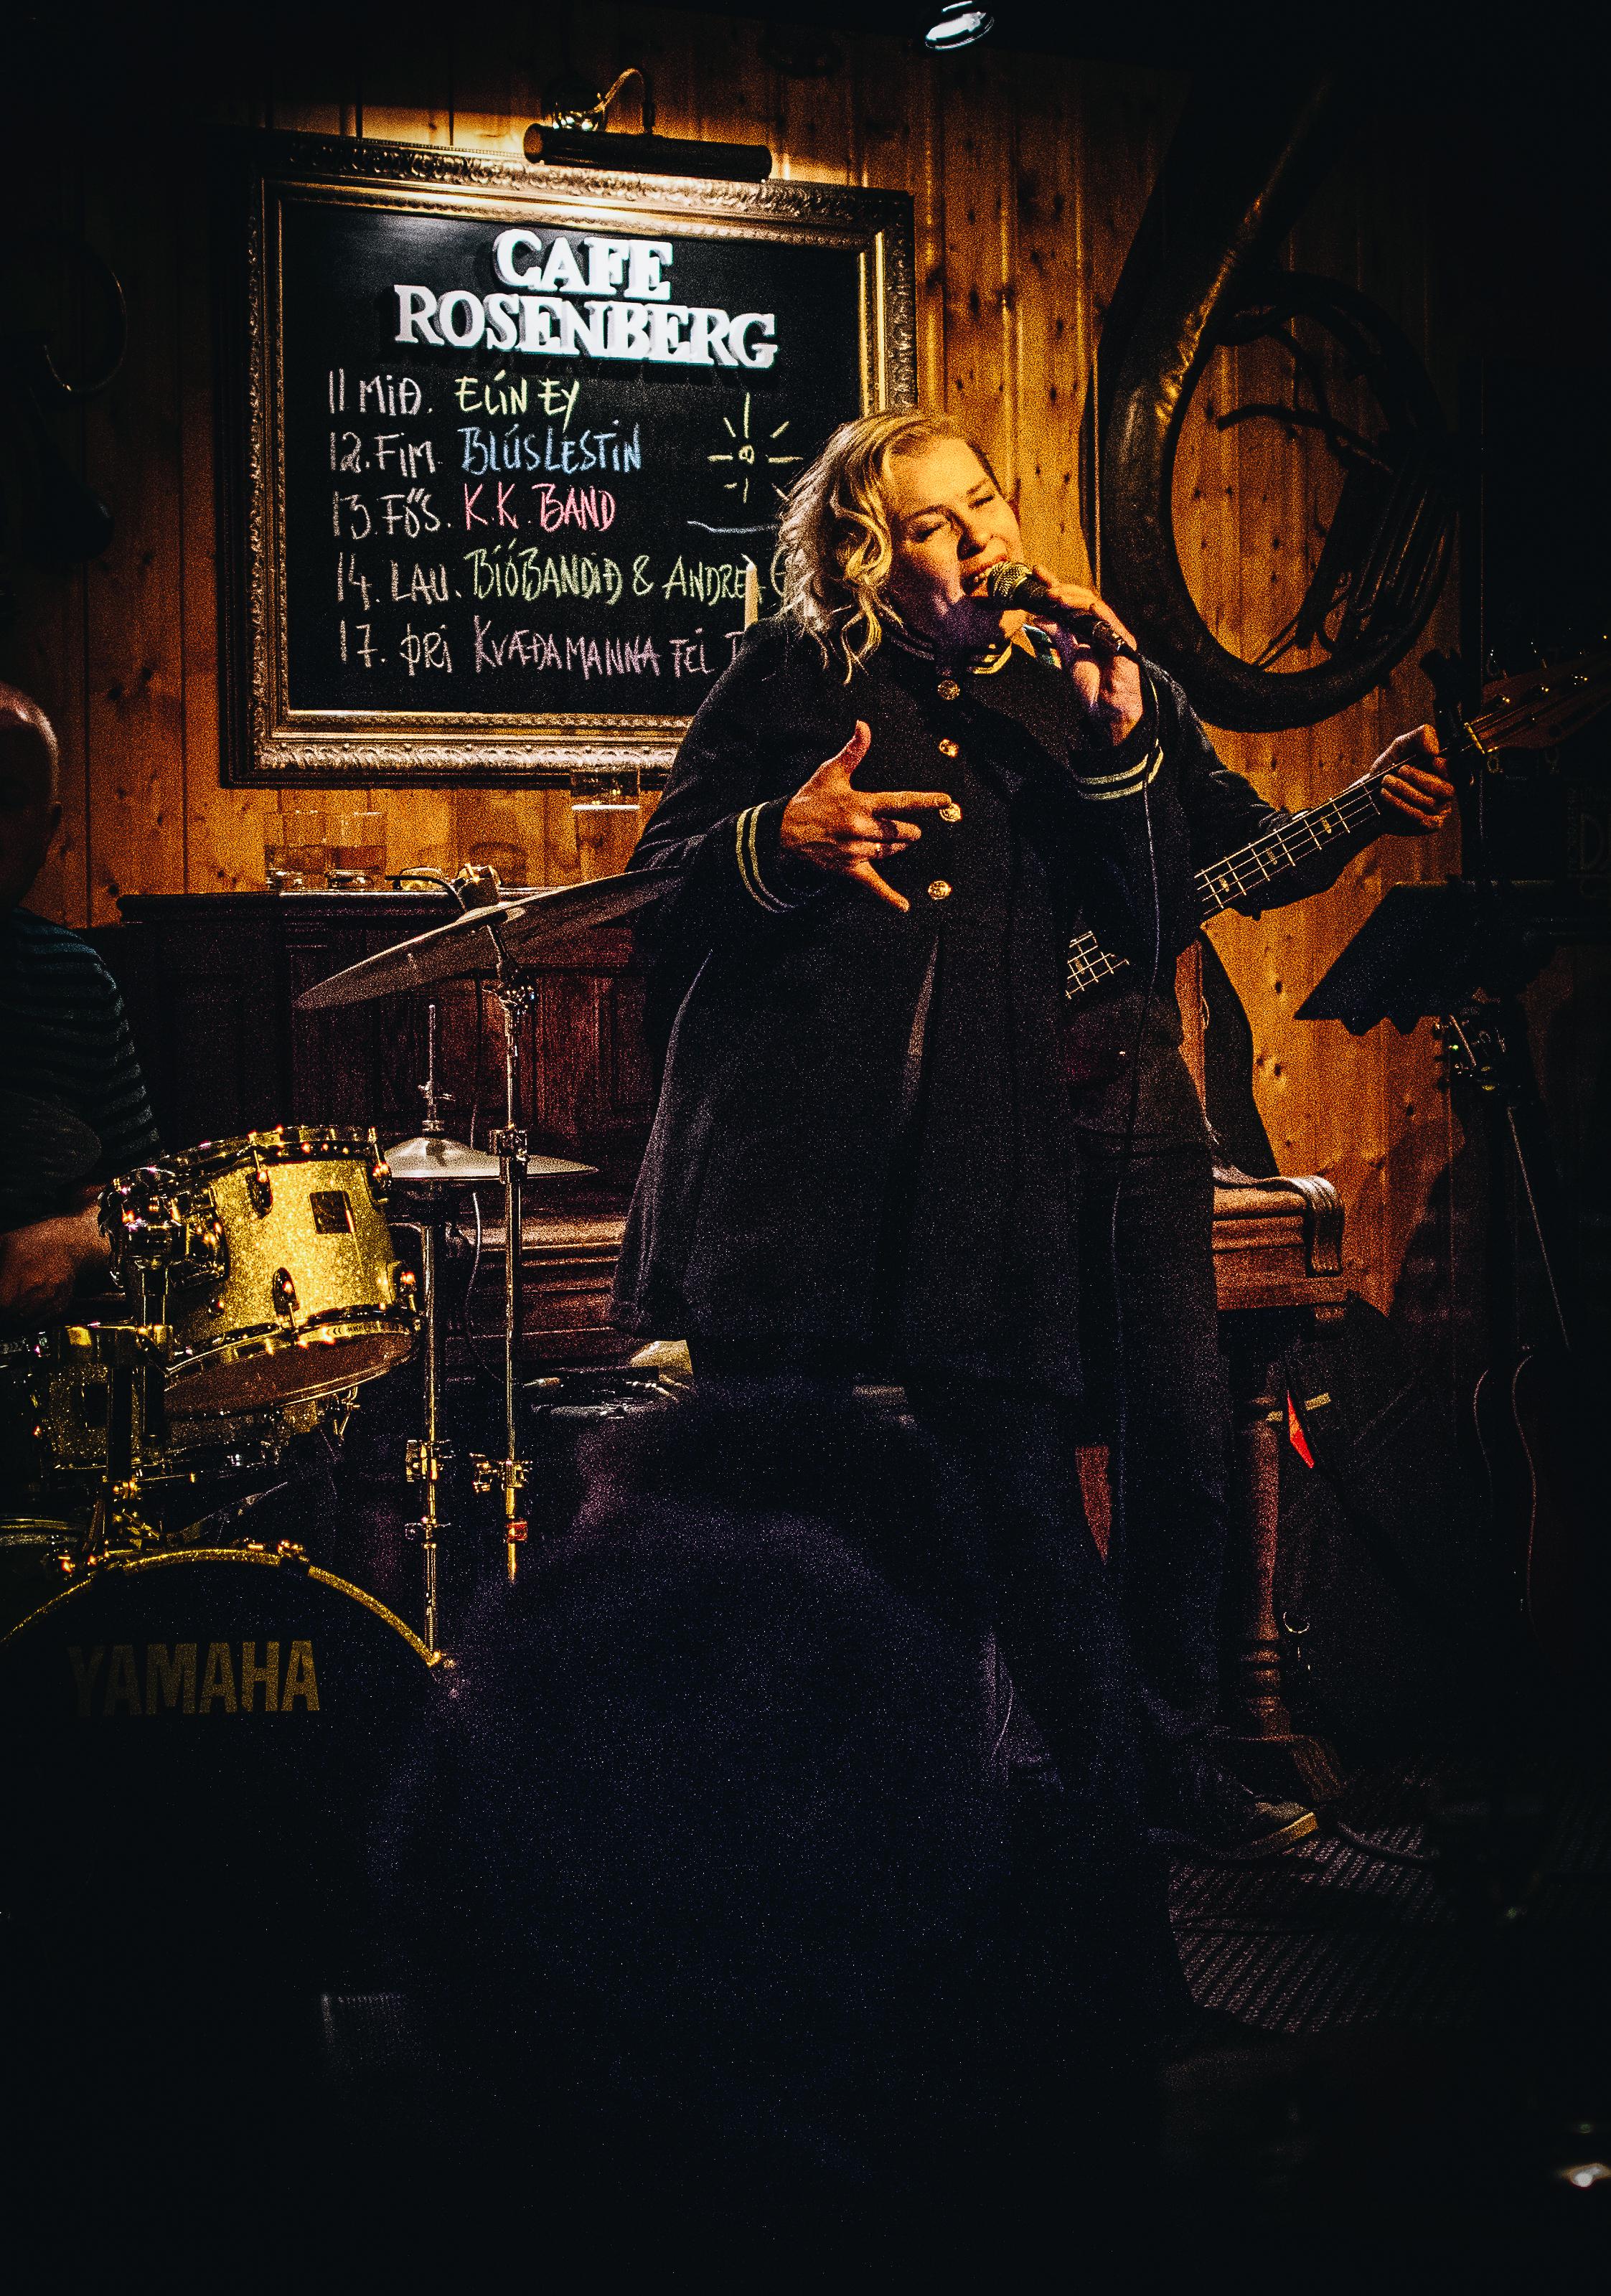 A friend of a friend was performing at Cafe Rosenberg and she was fantastic. Meet Andrea Gylfa og Bíóbandið!